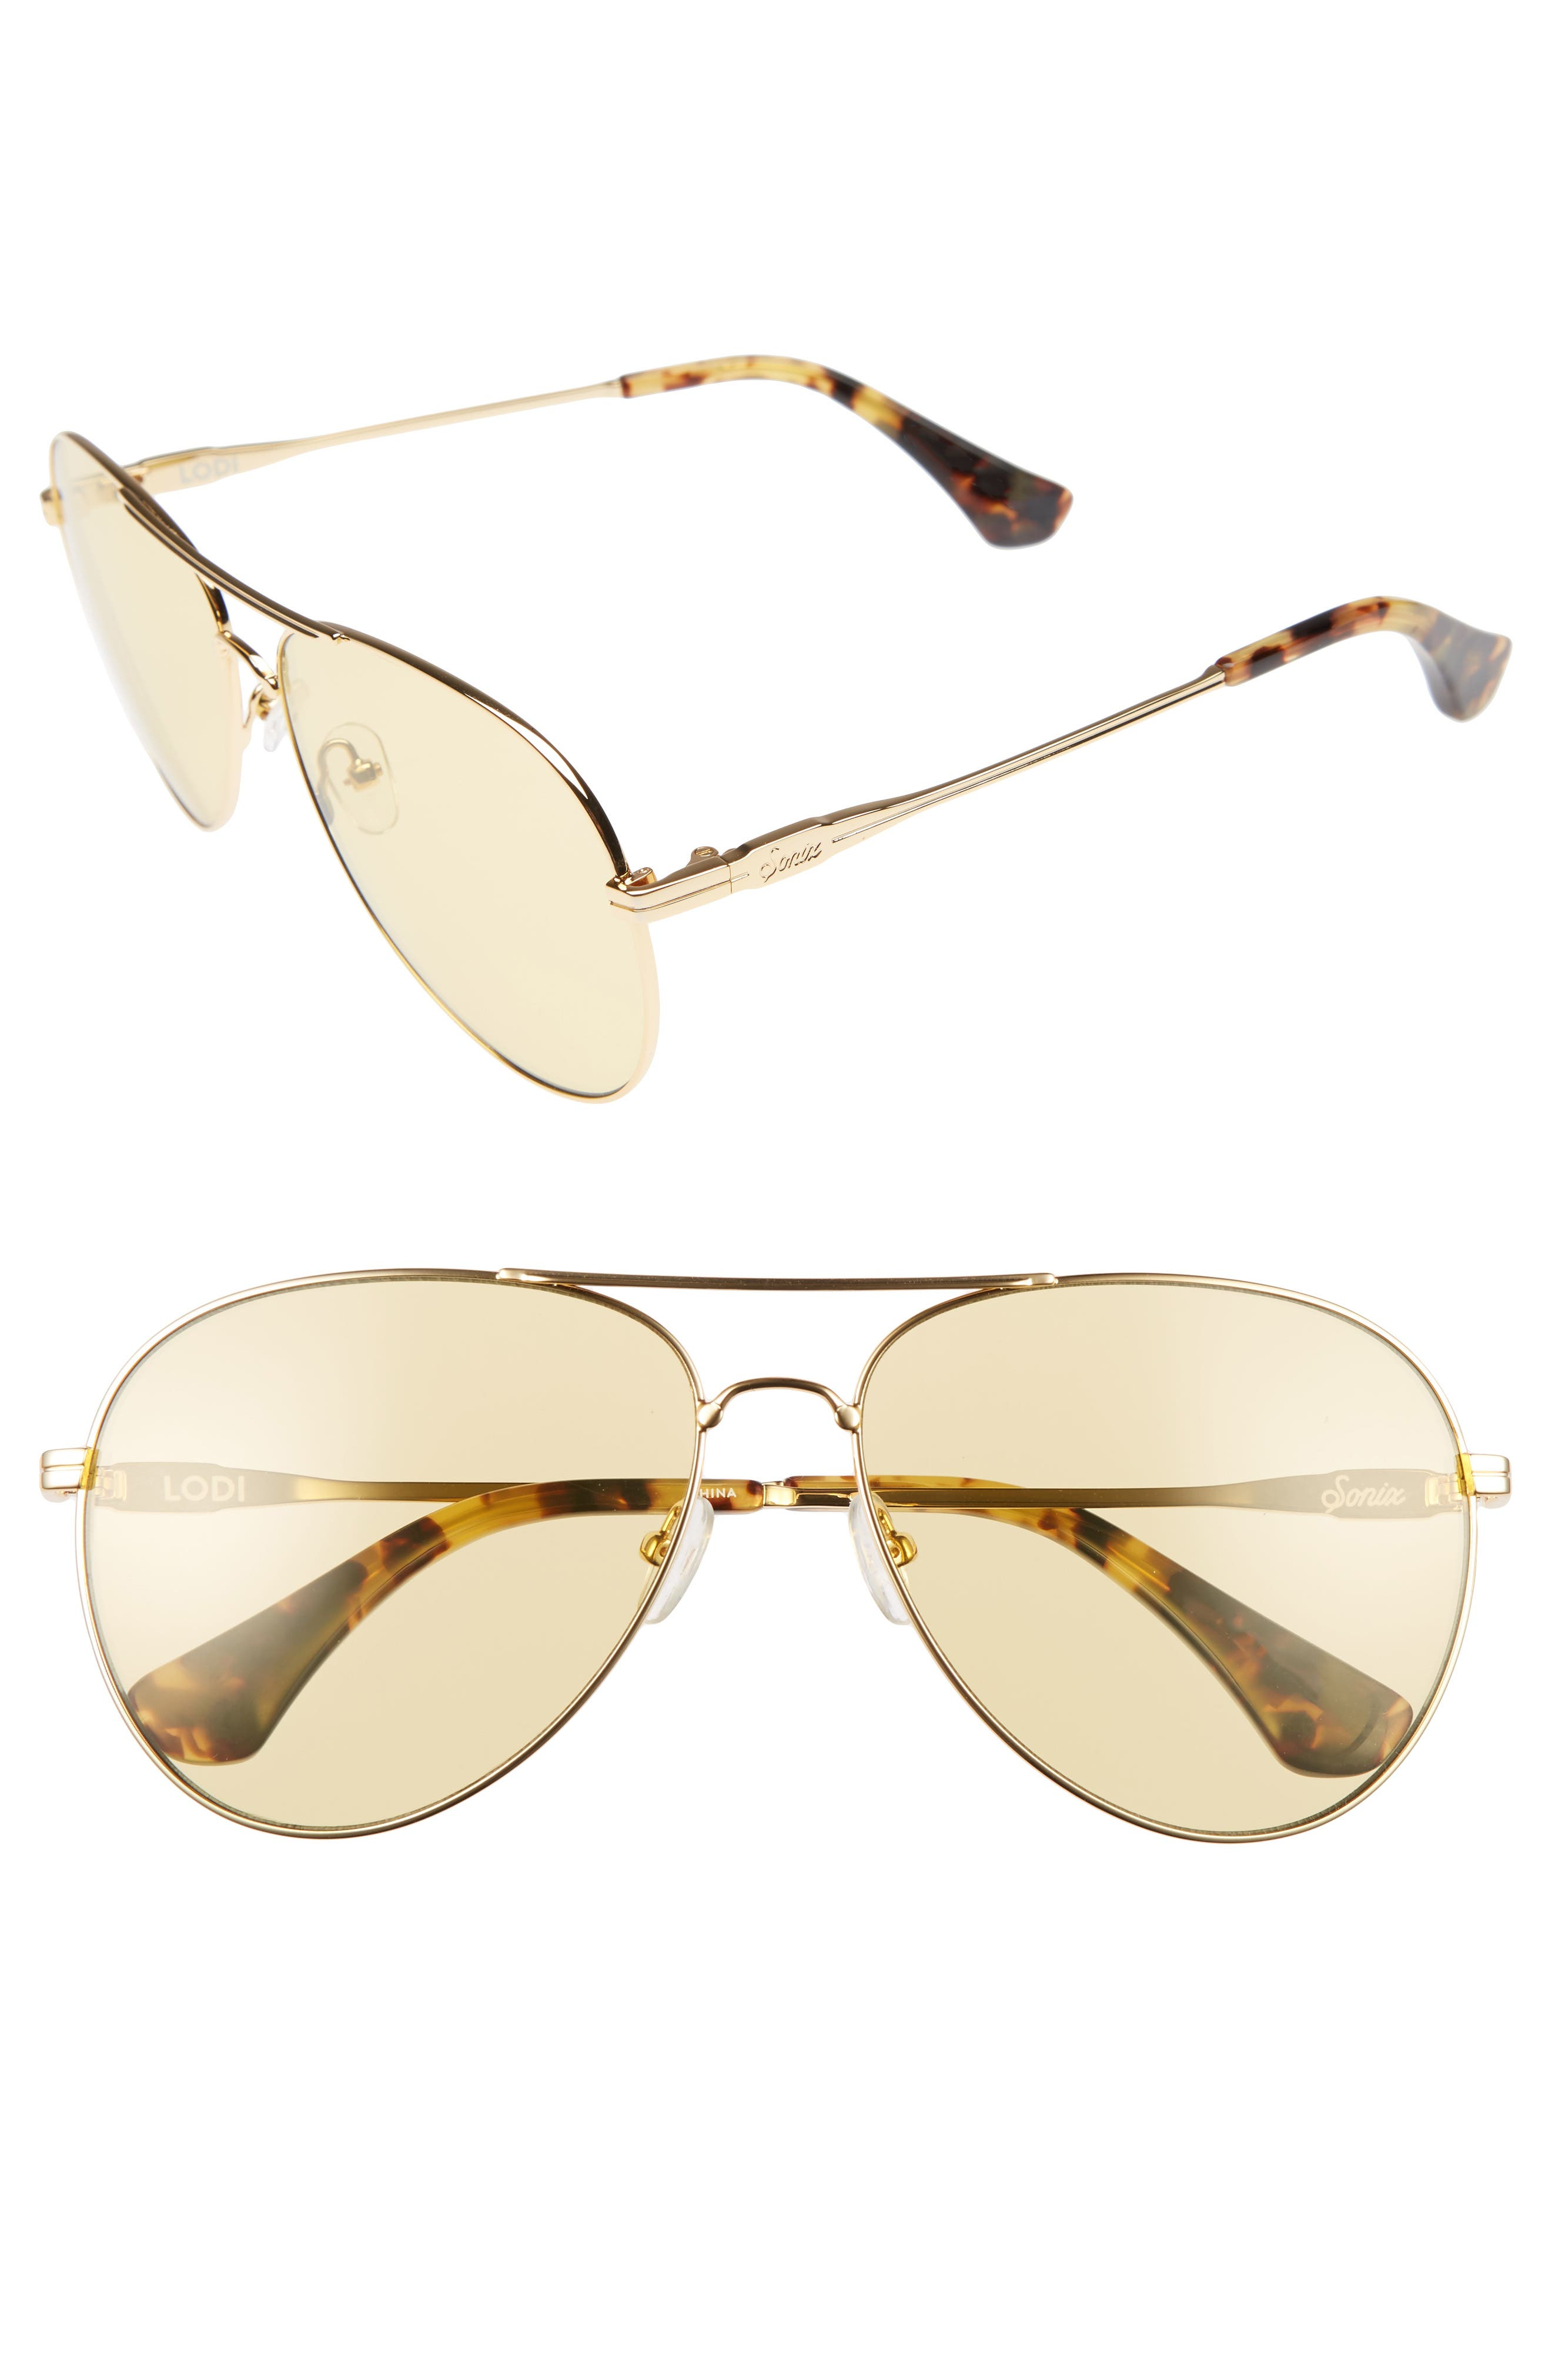 Lodi 62mm Mirrored Aviator Sunglasses,                             Alternate thumbnail 19, color,